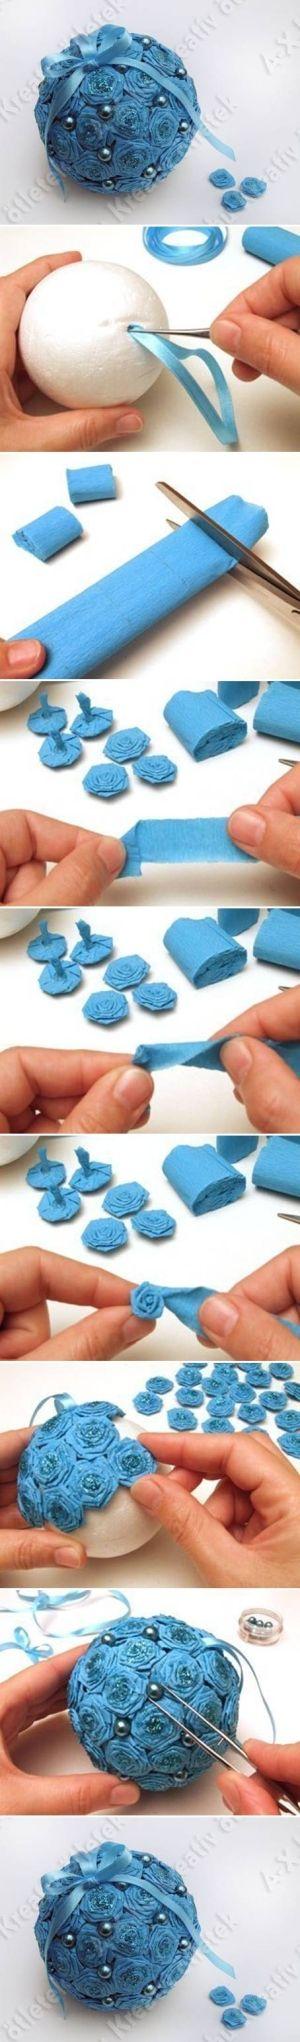 DIY Crepe Paper Flower Ball DIY Crepe Paper Flower Ball by diyforever